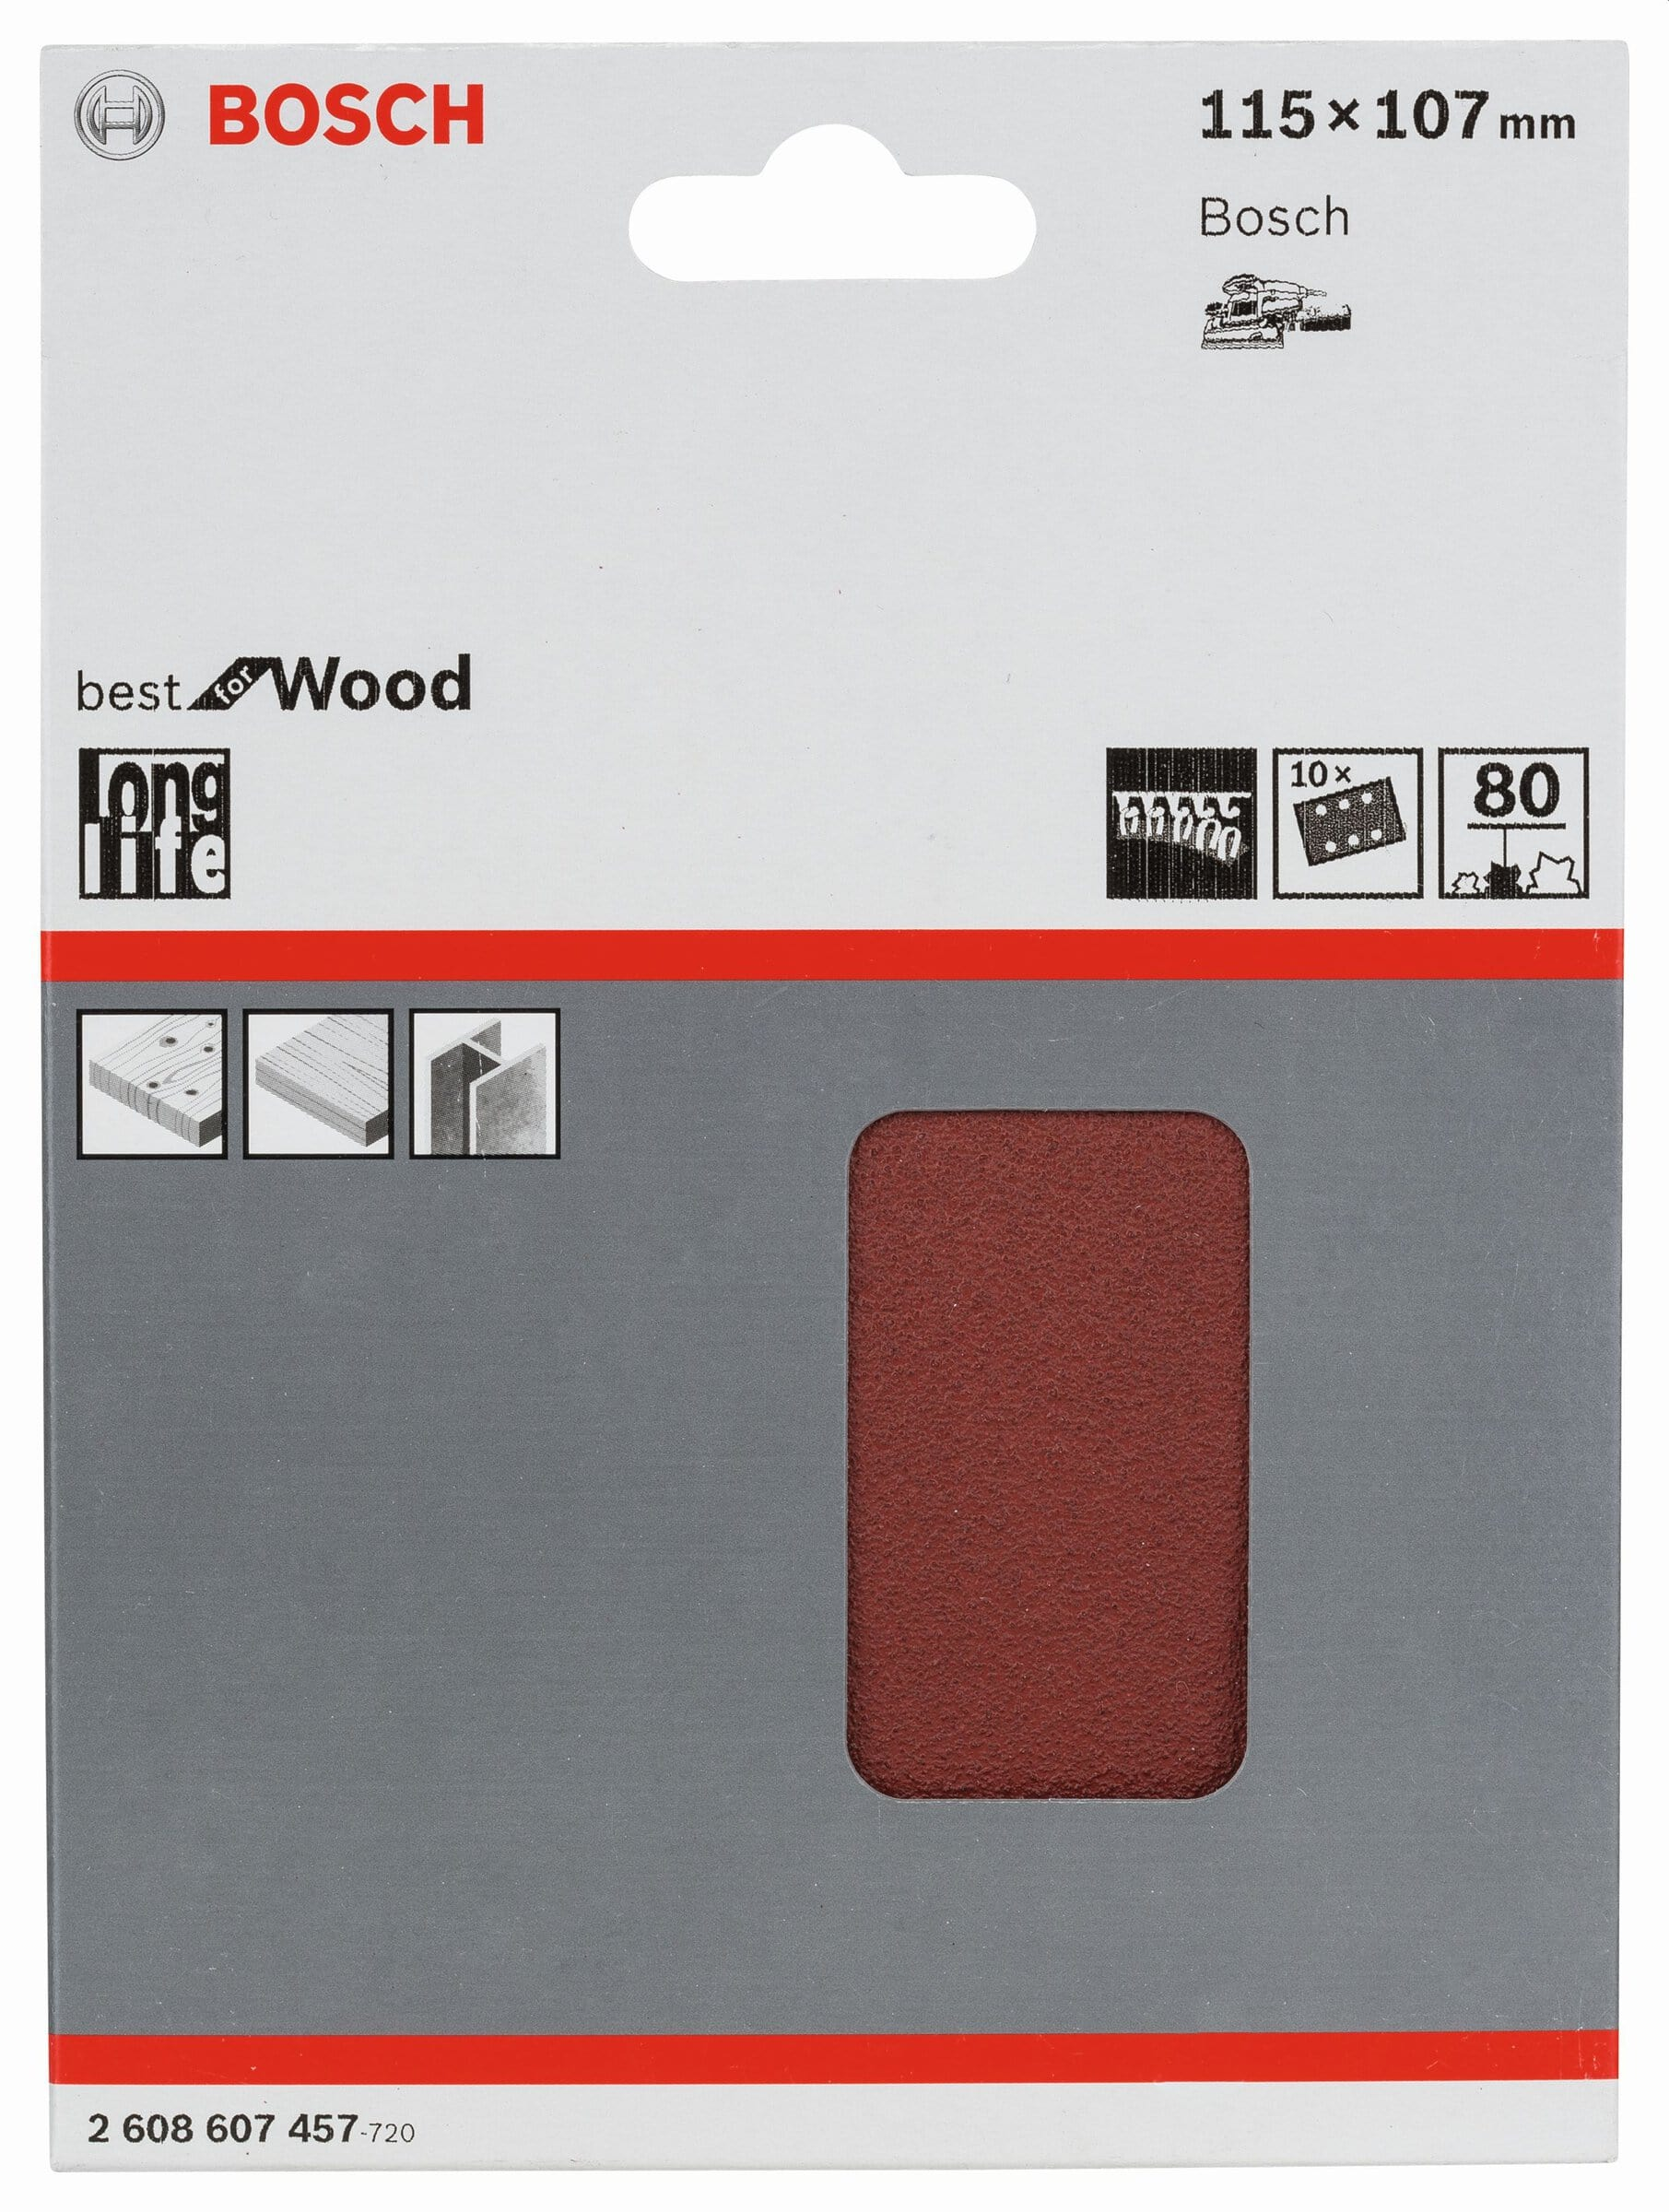 Bosch Professional Foglio abrasivo per GSS 18V 115x107mm K80